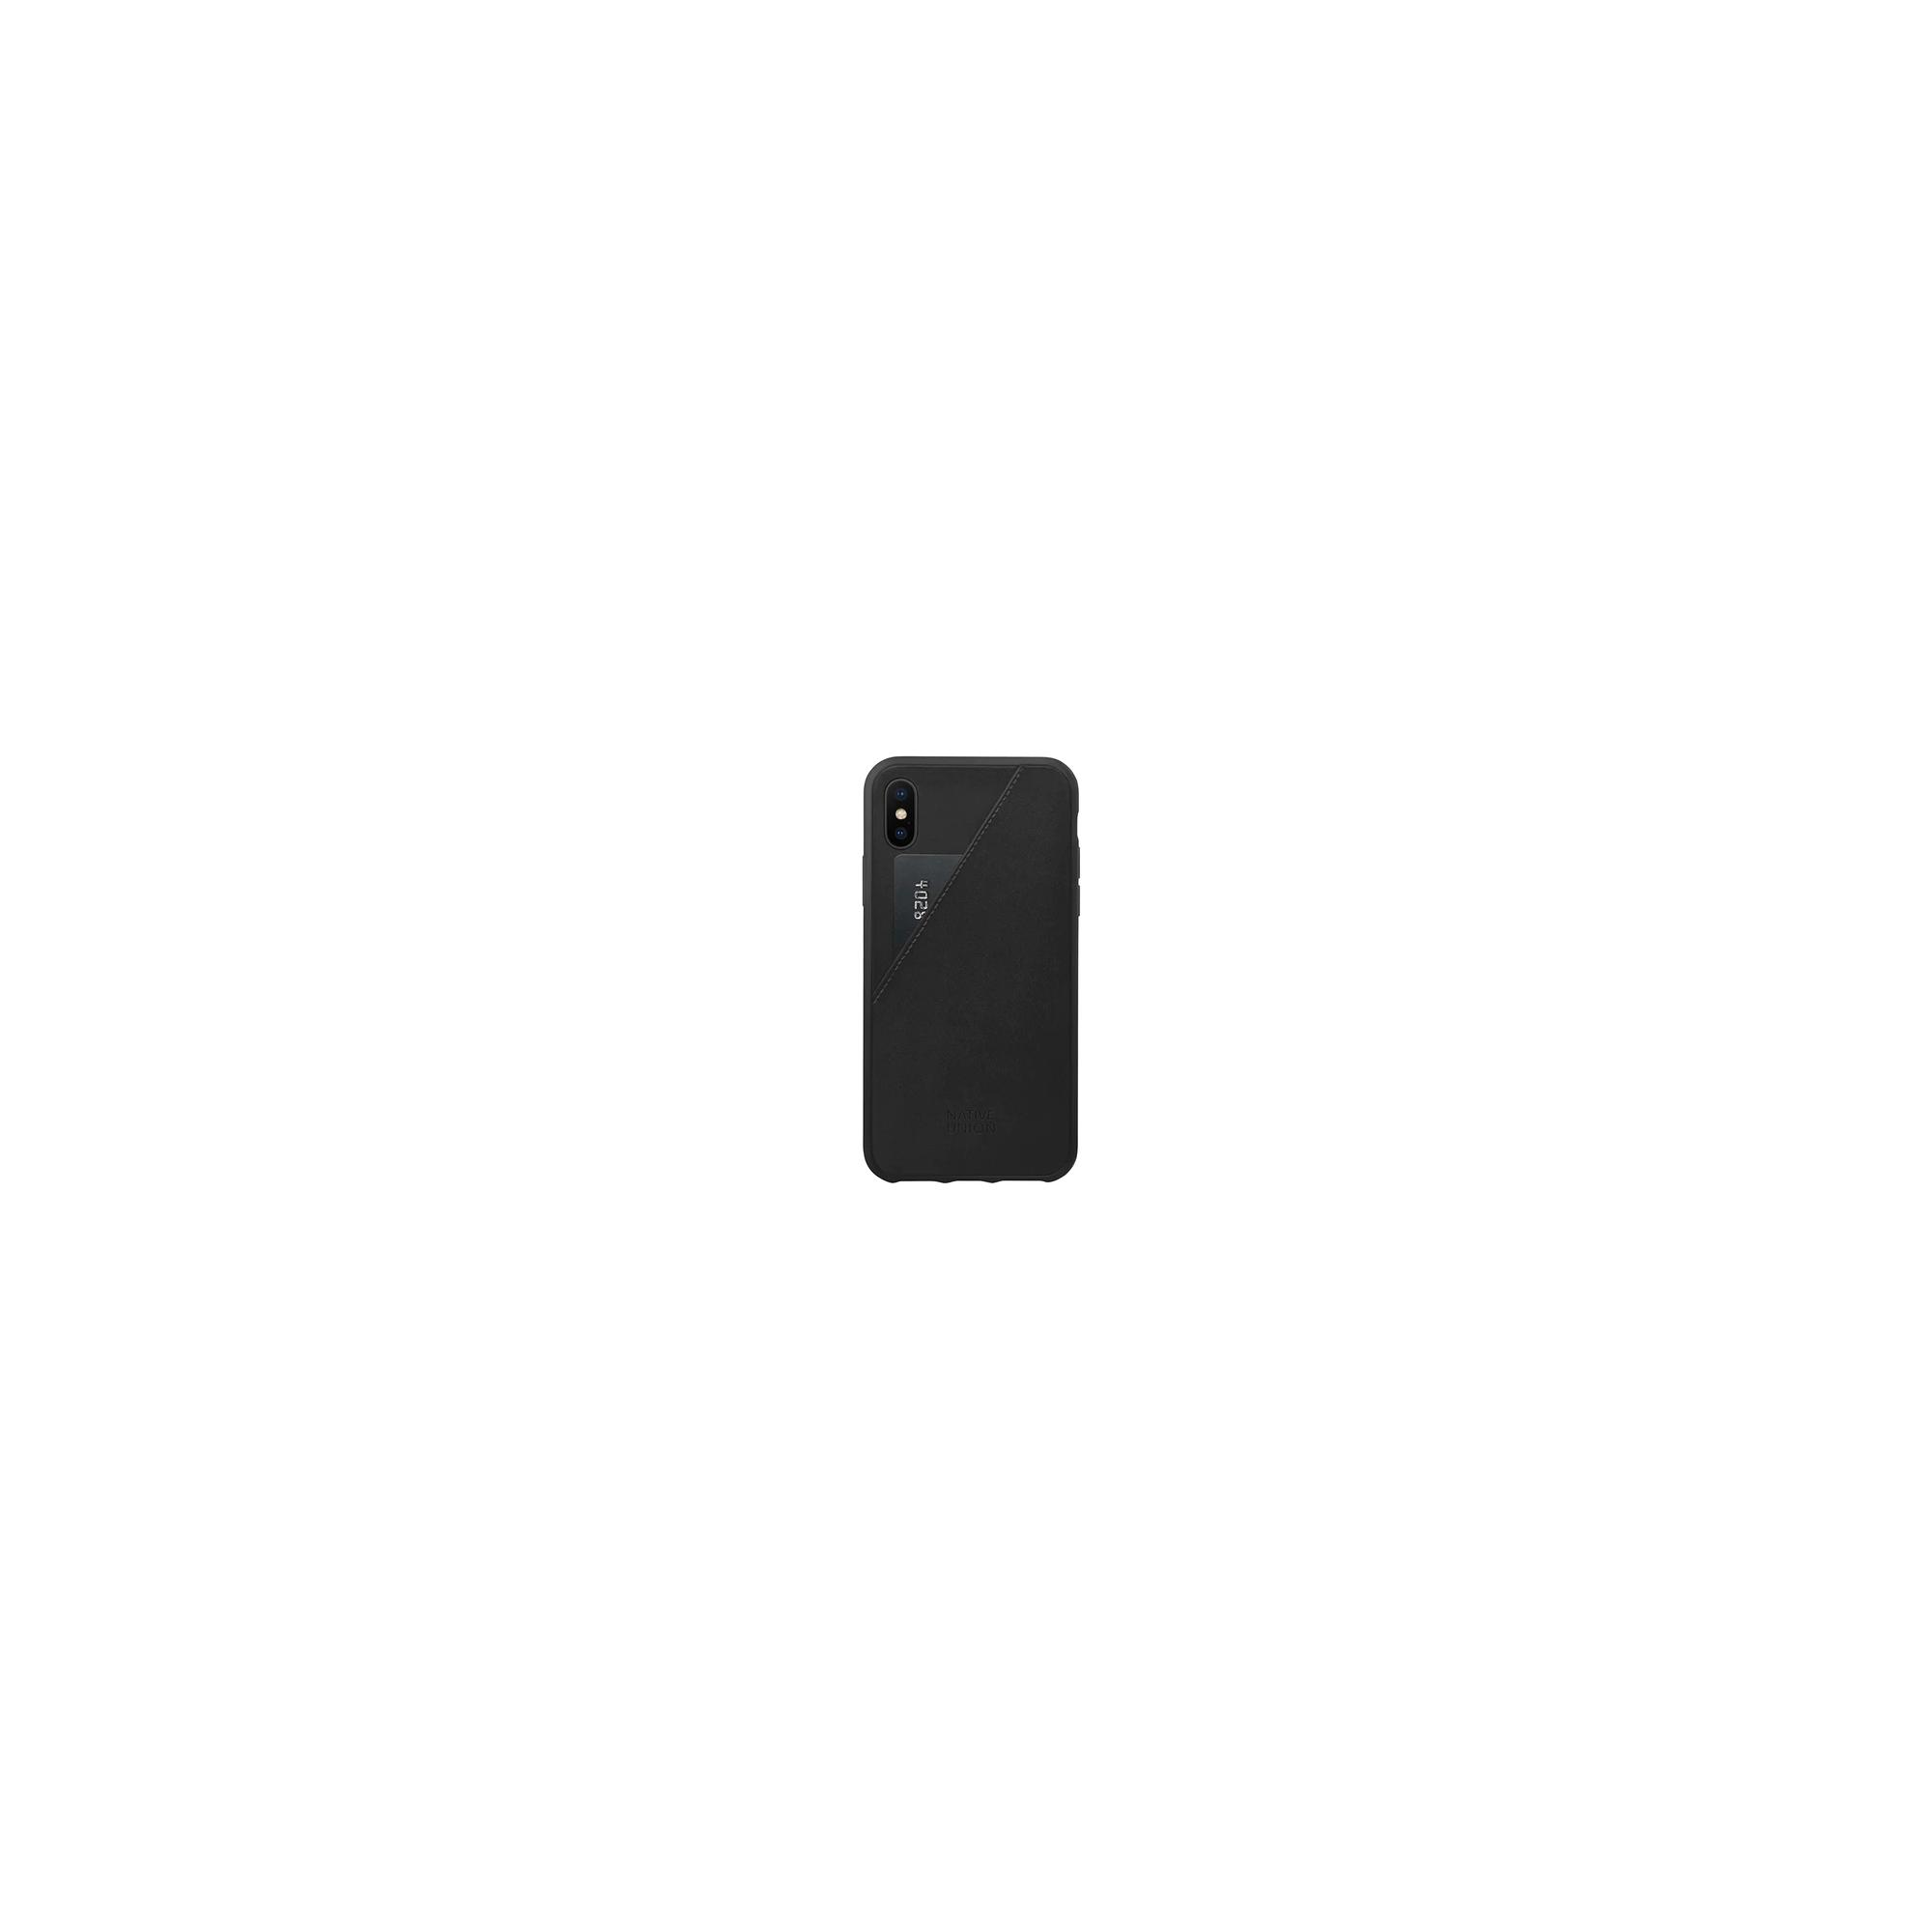 Clic Iphone X/Xs - Black